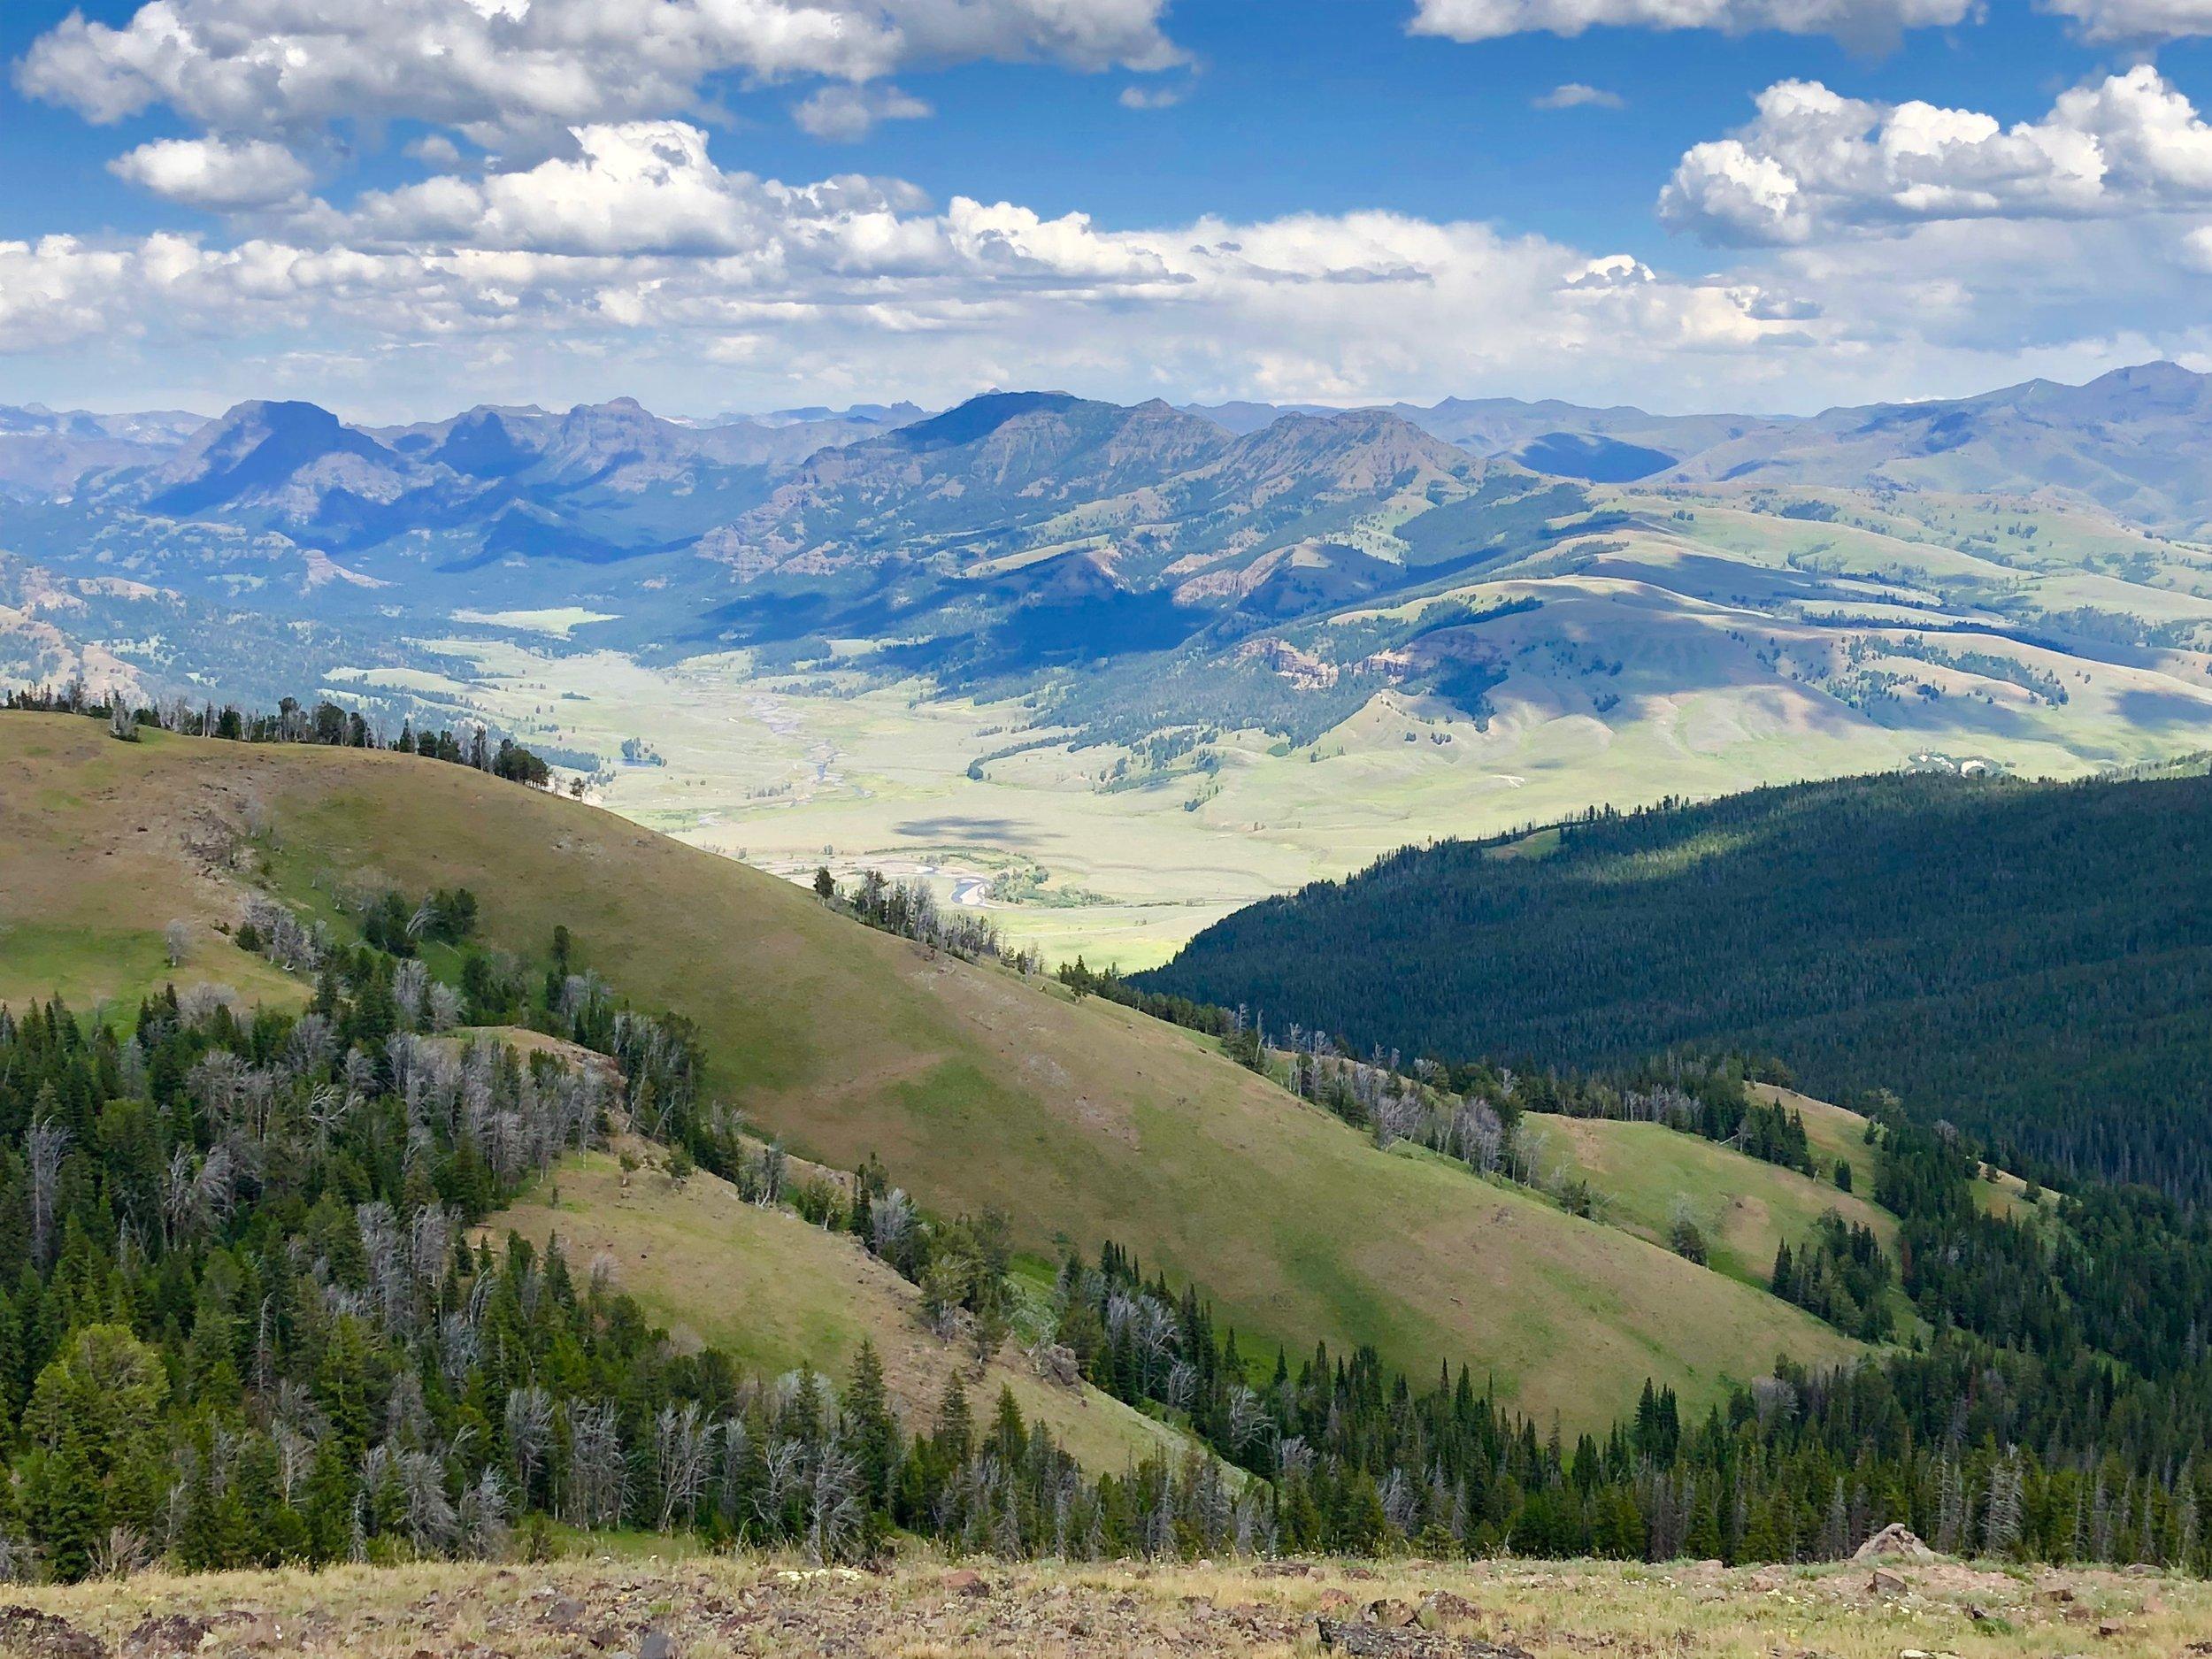 The summit of Amethyst Mountain. Elevation 9,614 feet